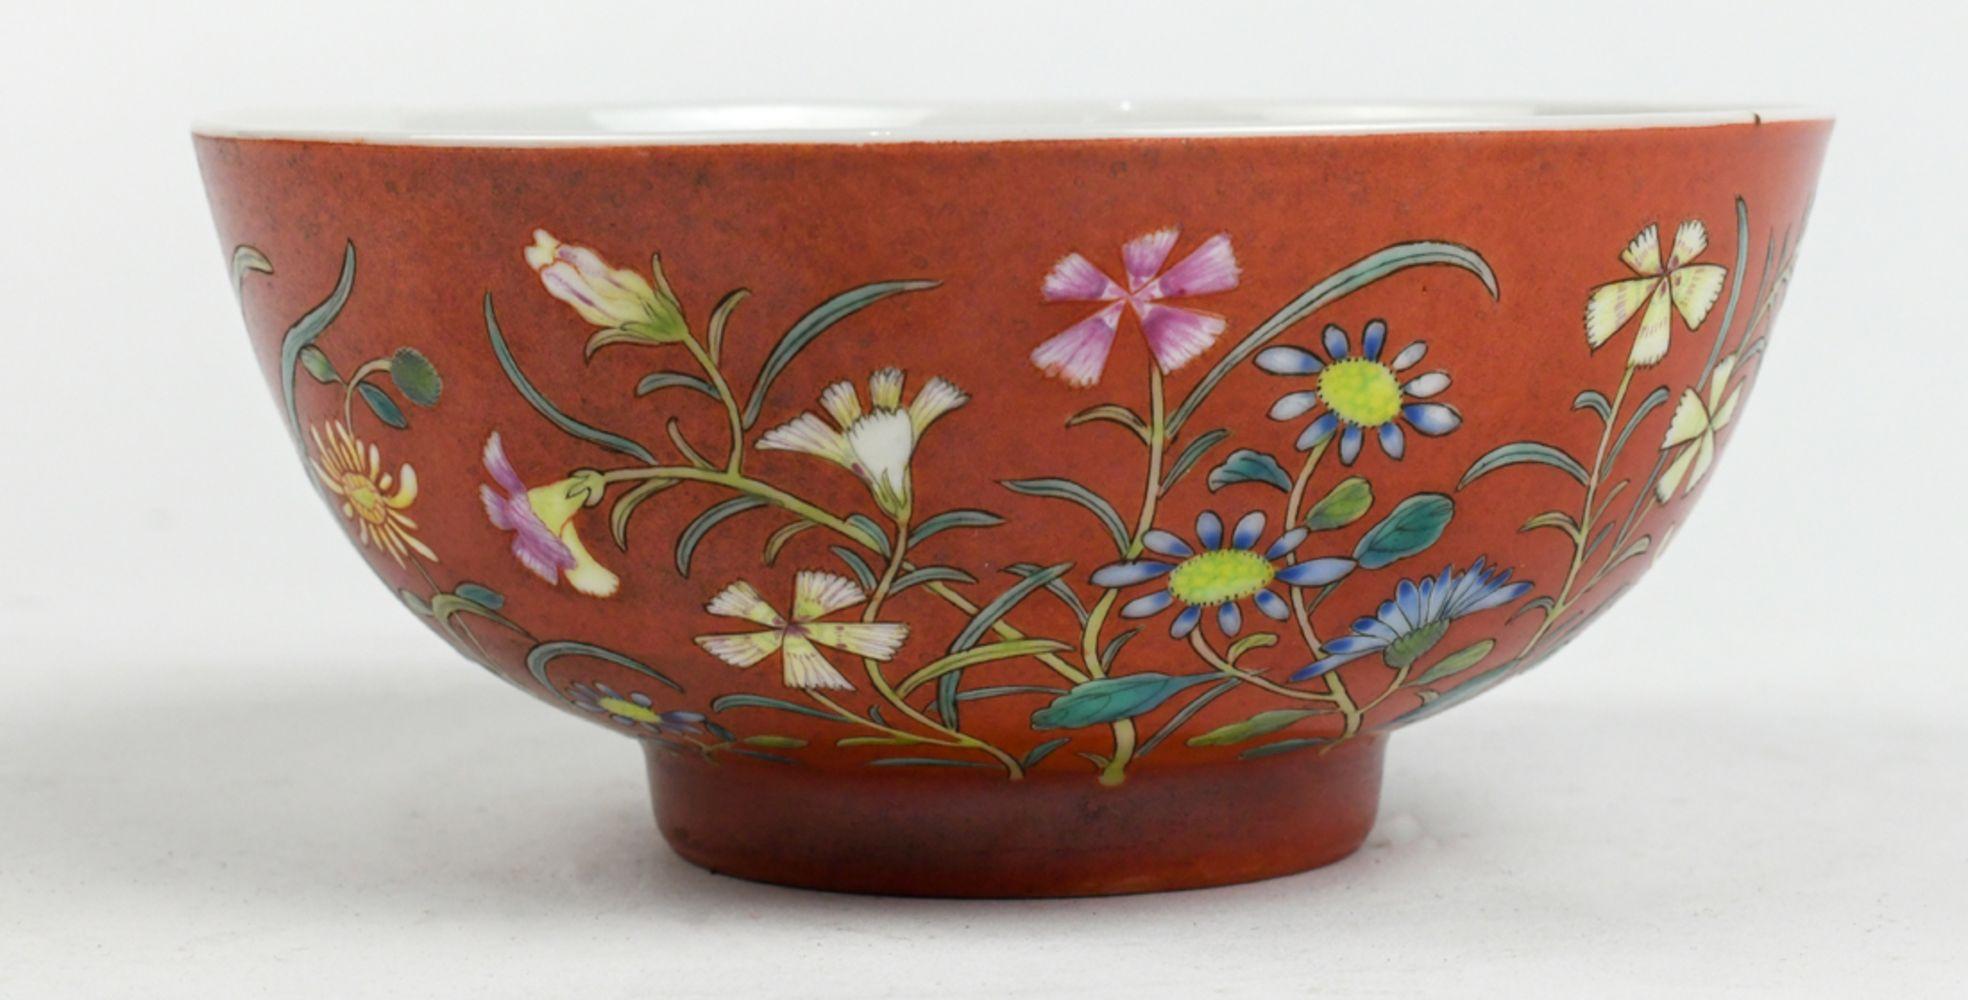 Jubilant July Fine Art, Furniture, Decoratives, Jewellery, and Asian Art Auction